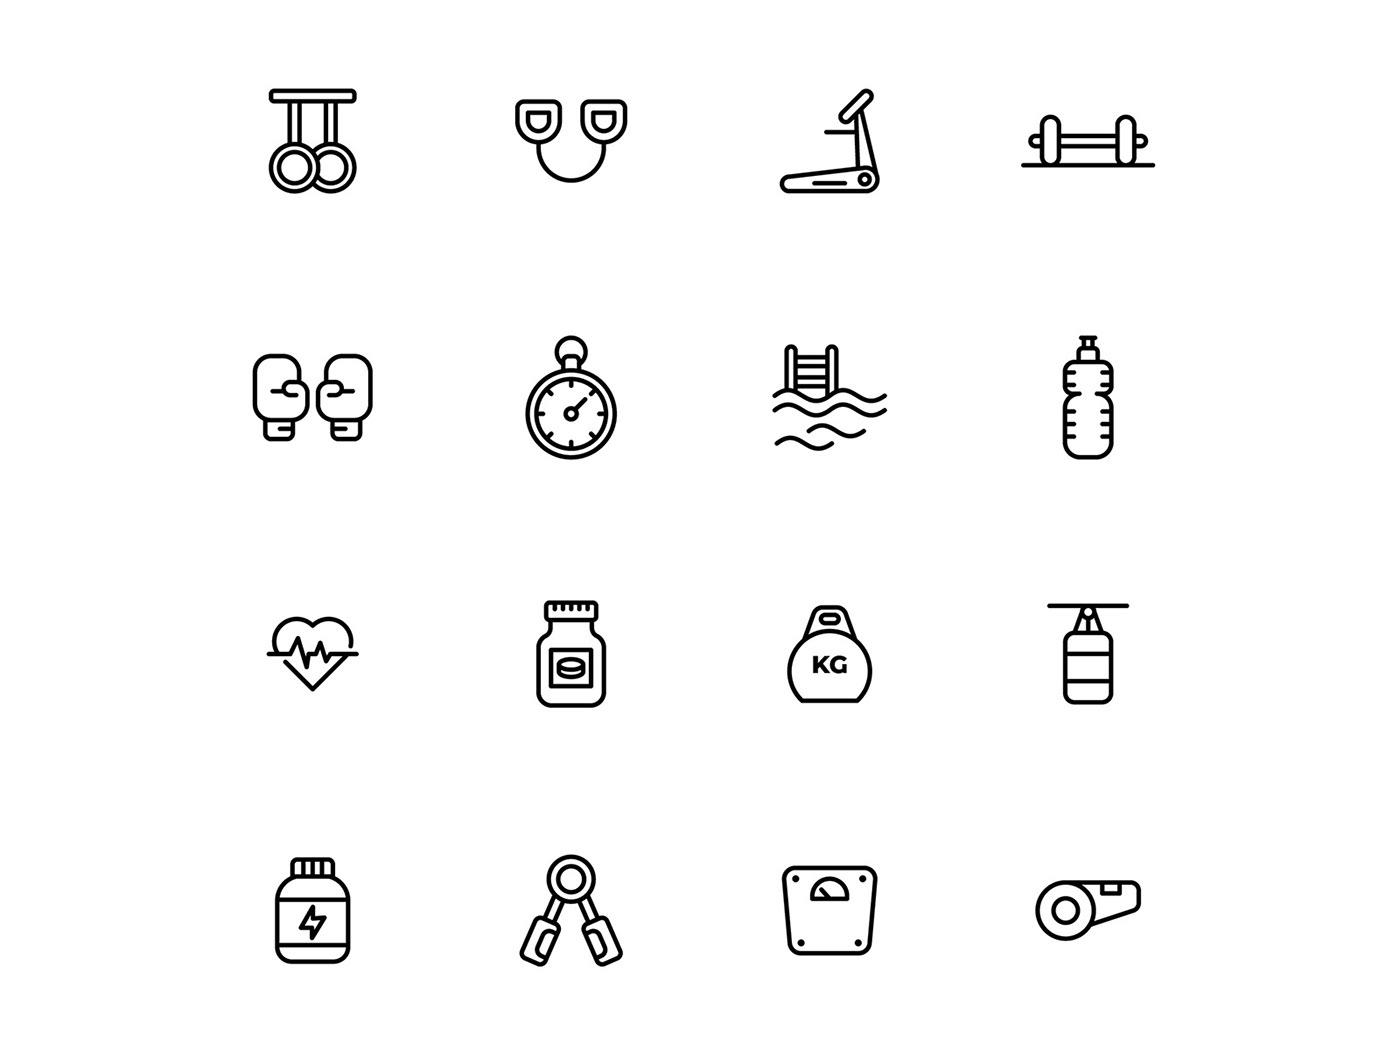 freebie gym gym icon gym vector icon design  icons download icons pack icons set vector design vector icon